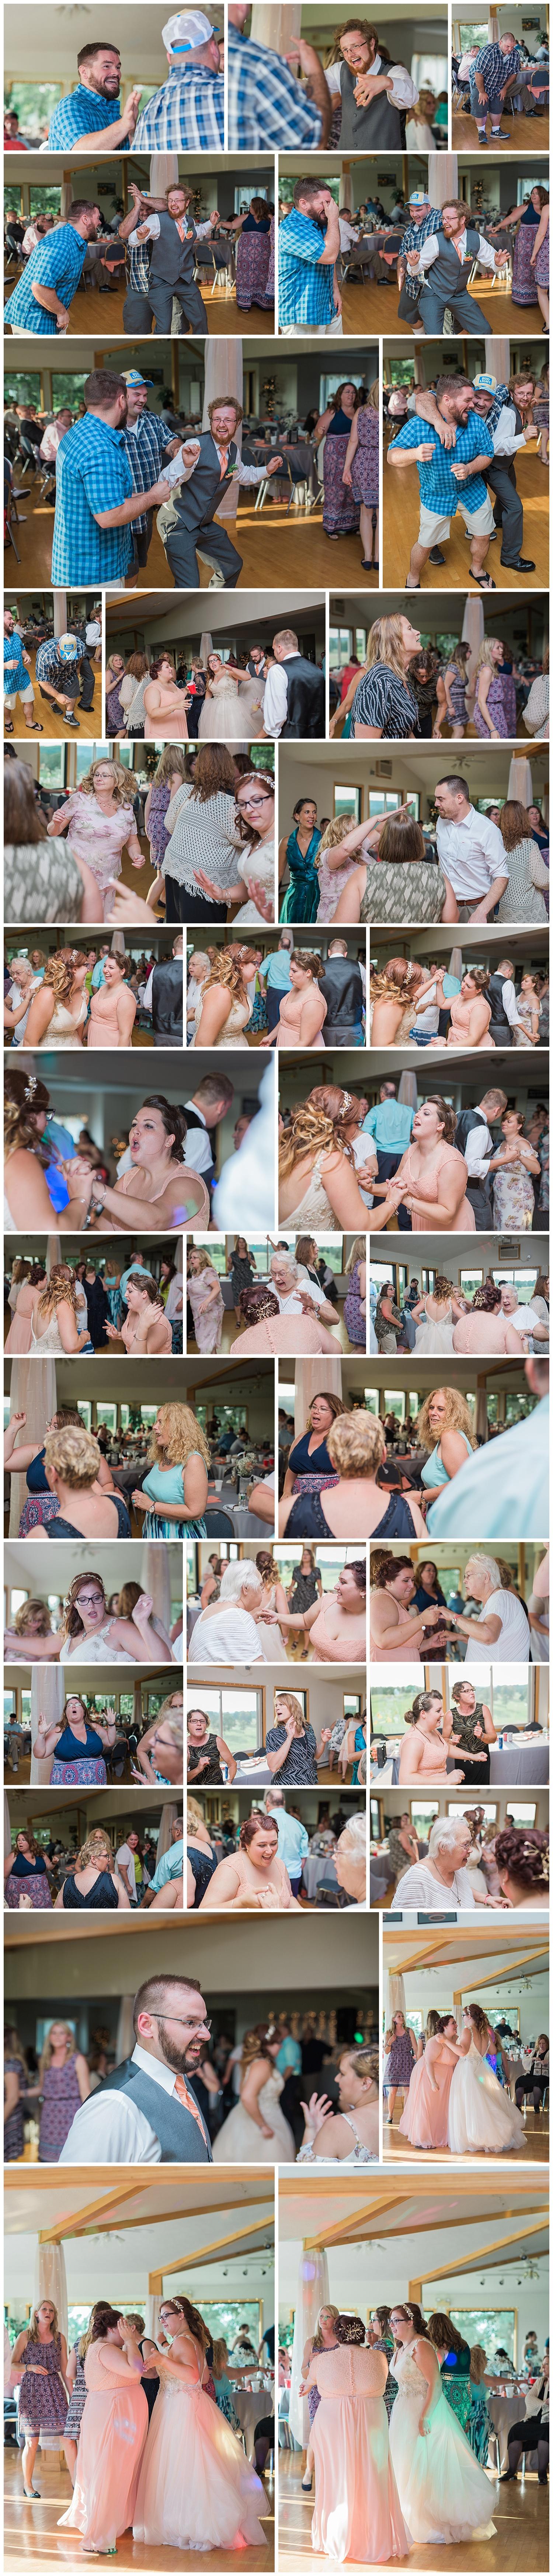 Brian and Molly Wed in Conesus NY - Lass & Beau-1266_Buffalo wedding photography.jpg